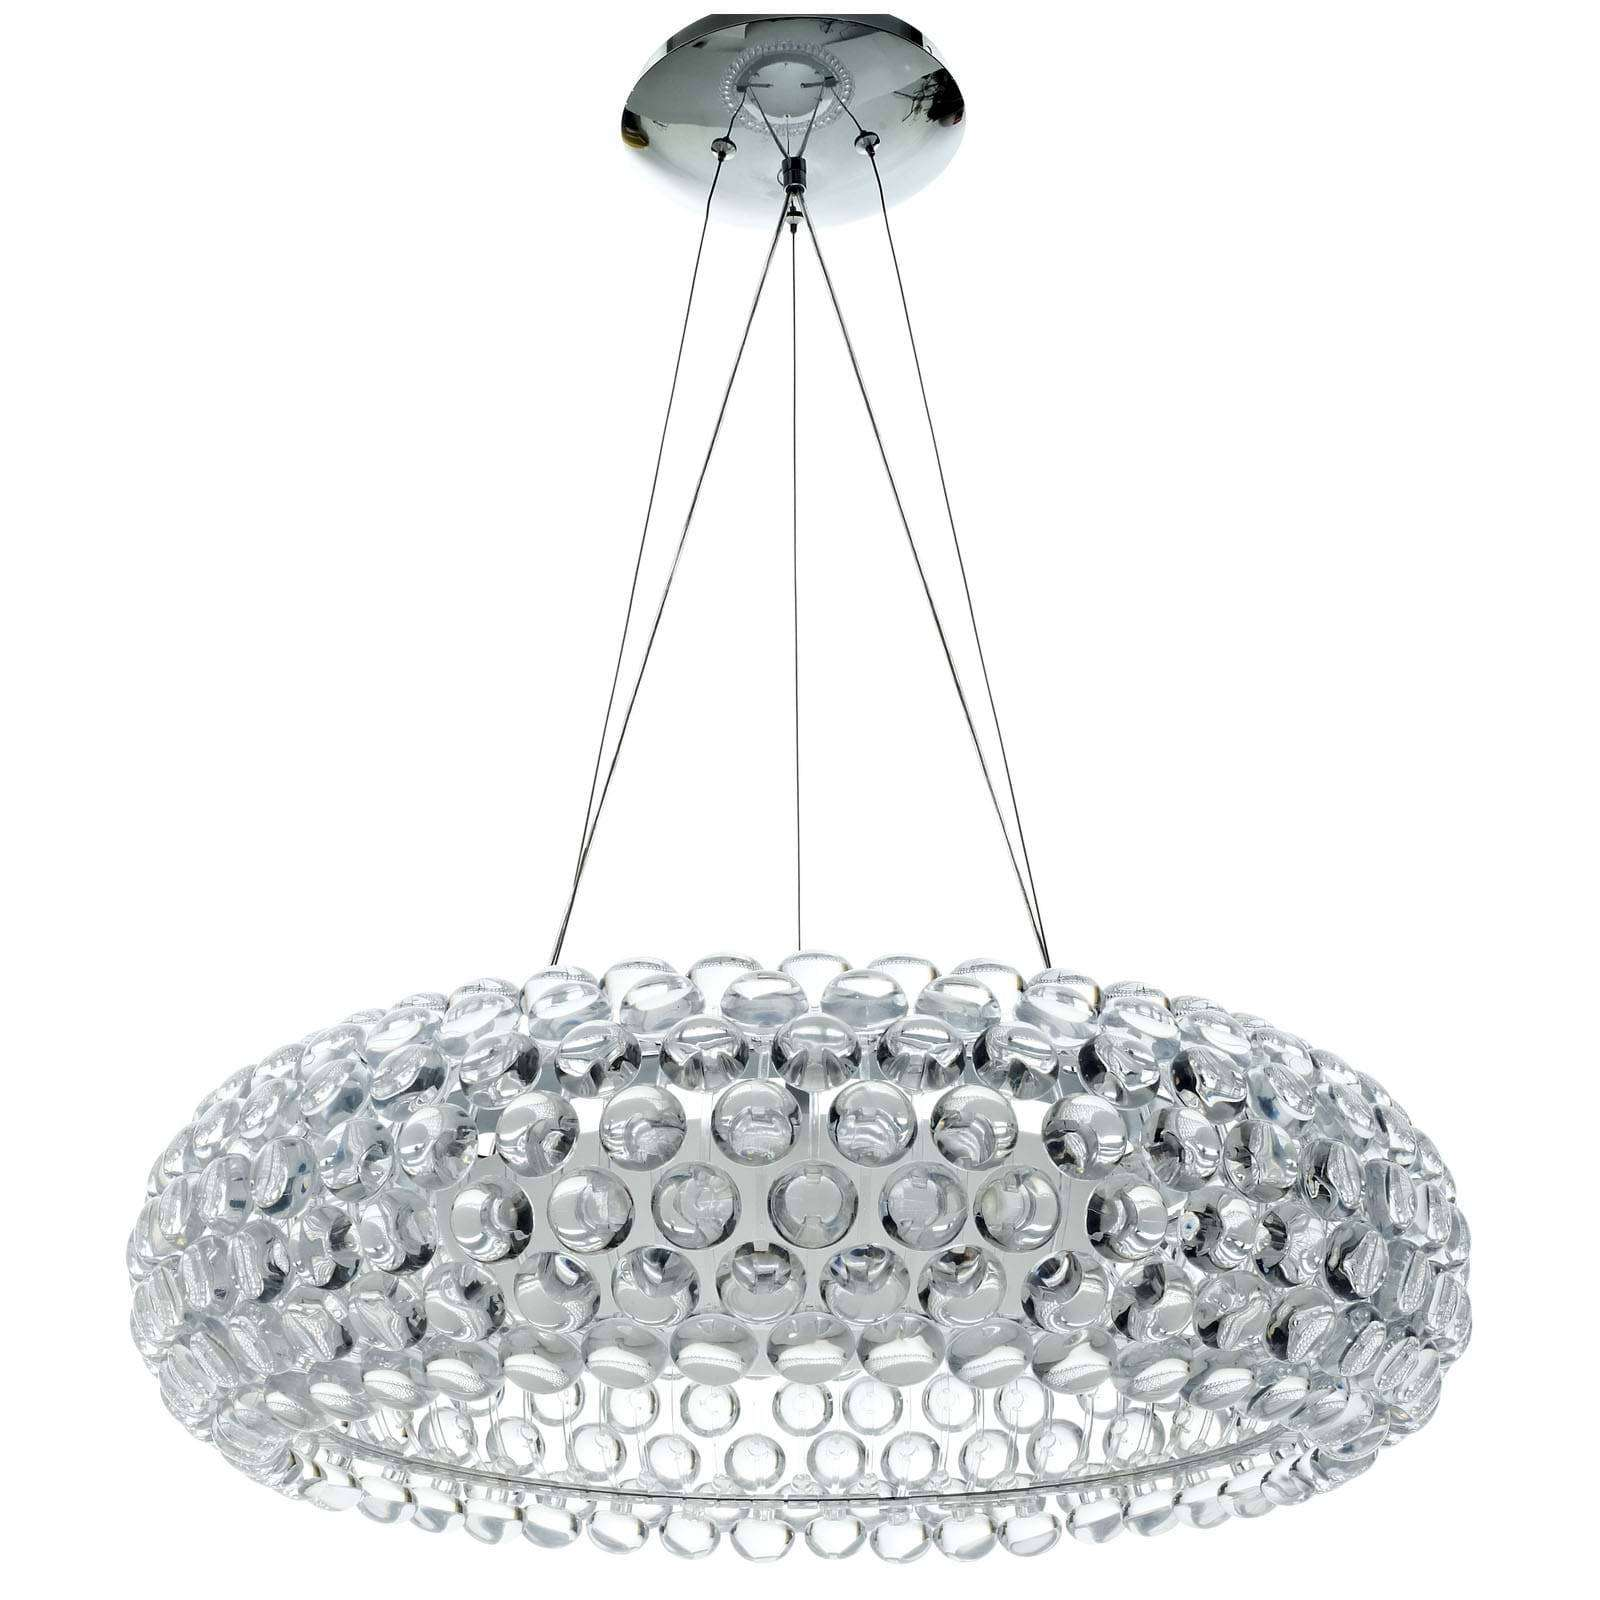 Modterior lighting chandeliers halo 25 acrylic chandelier halo 25 acrylic chandelier arubaitofo Gallery